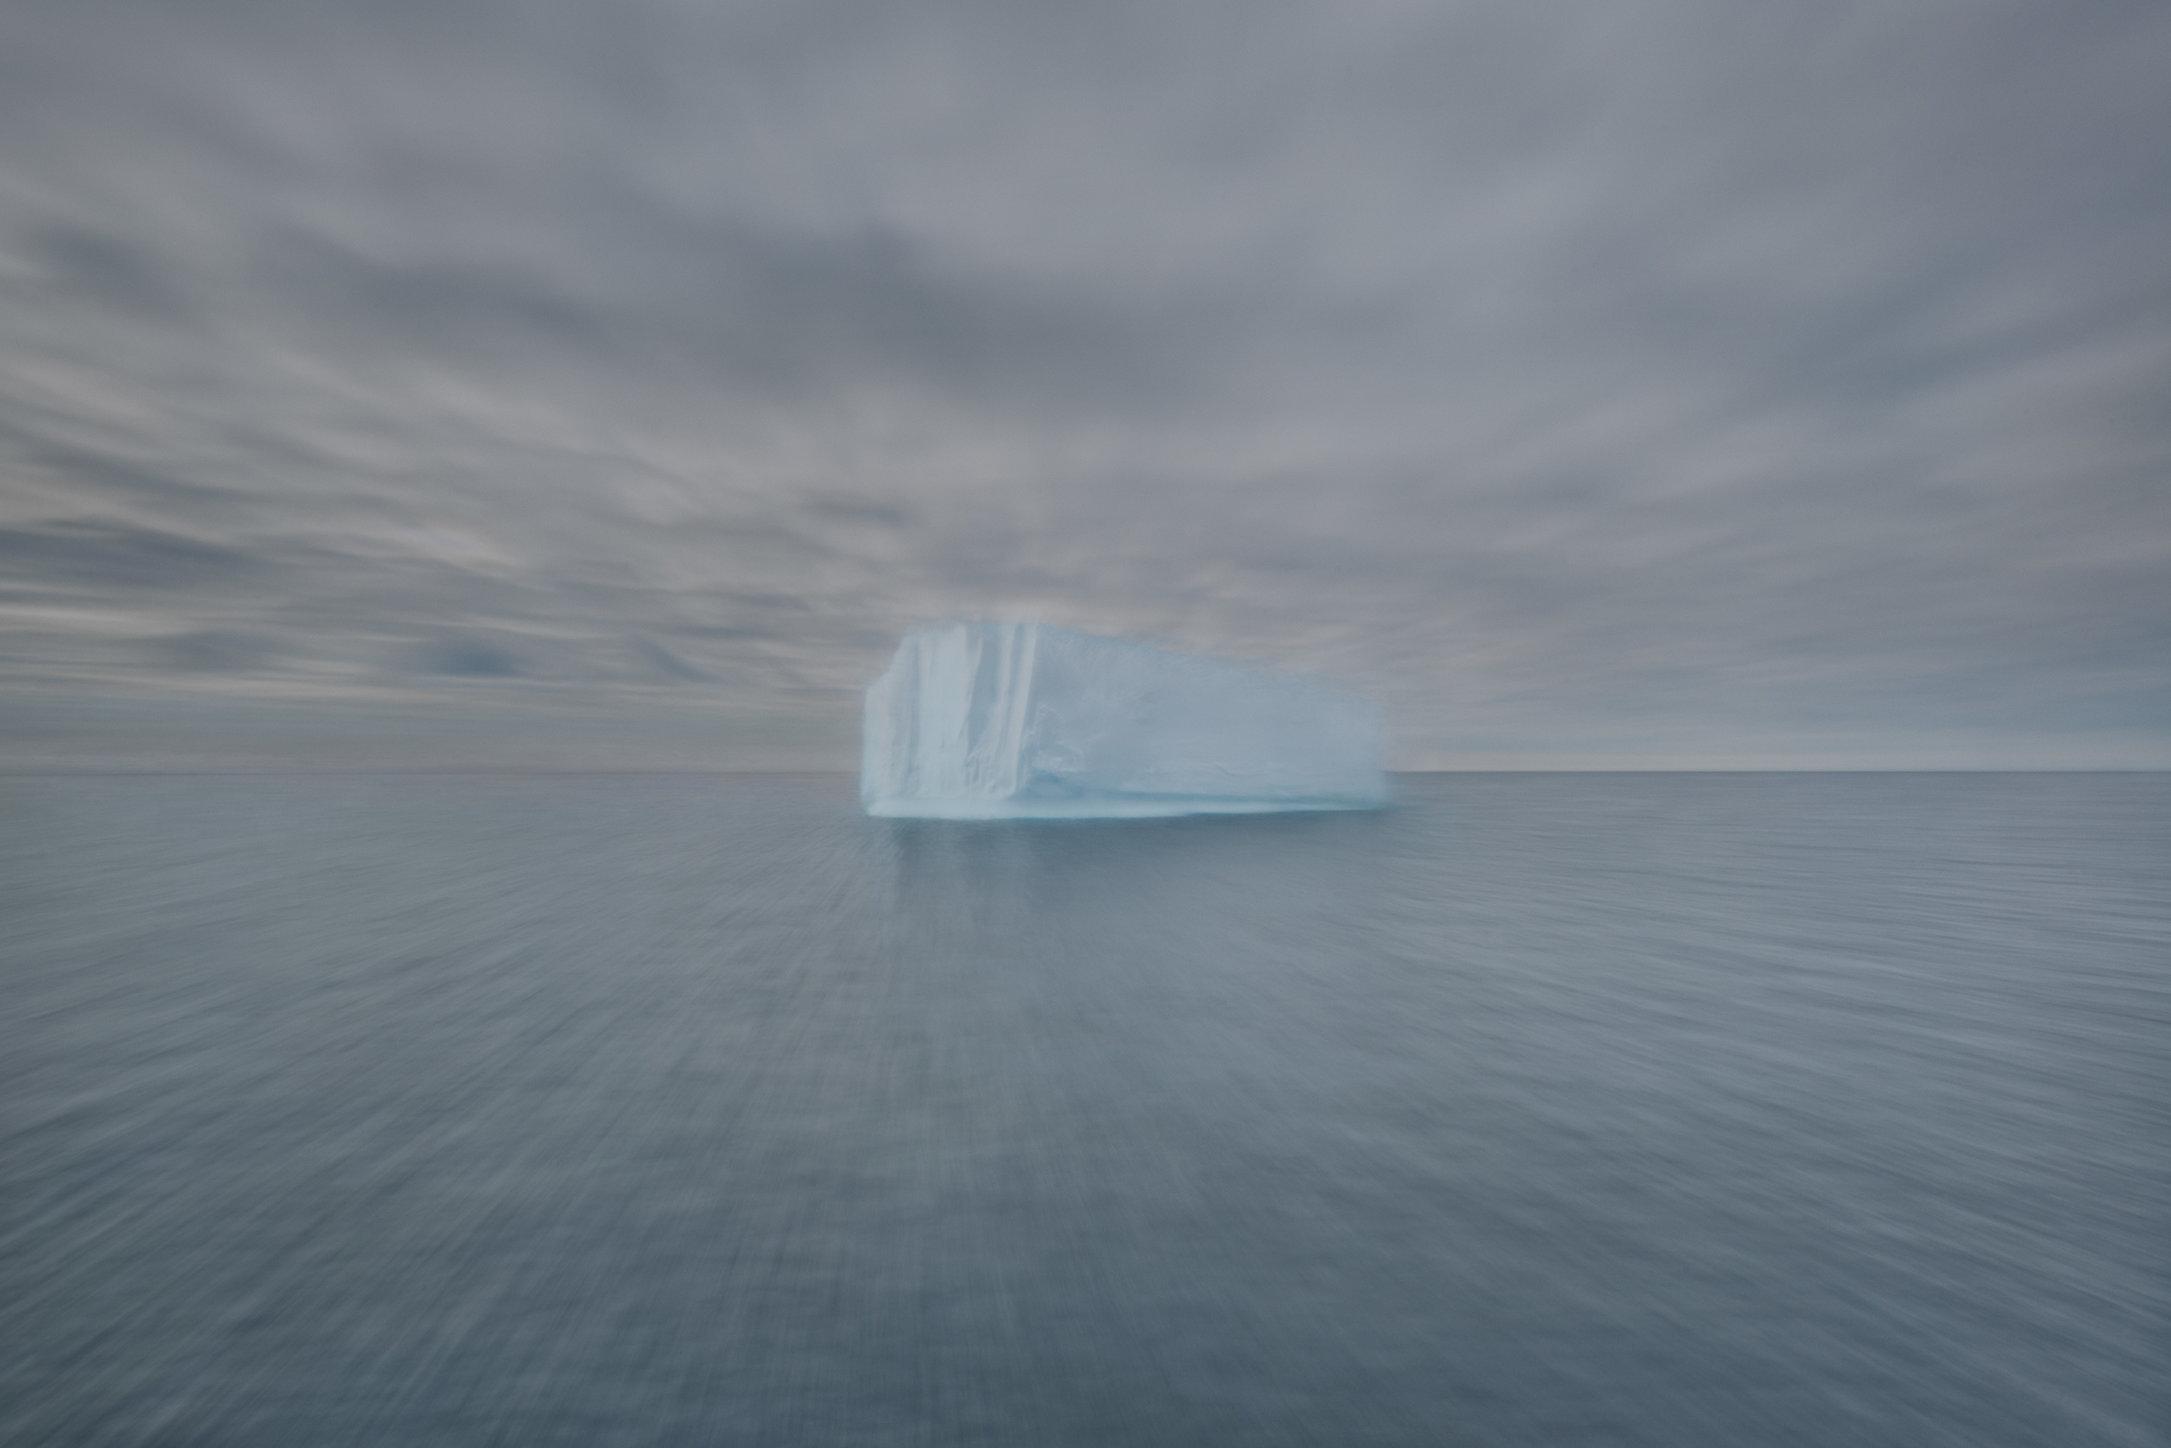 Land / Antarctica / Holy Spirit Passage